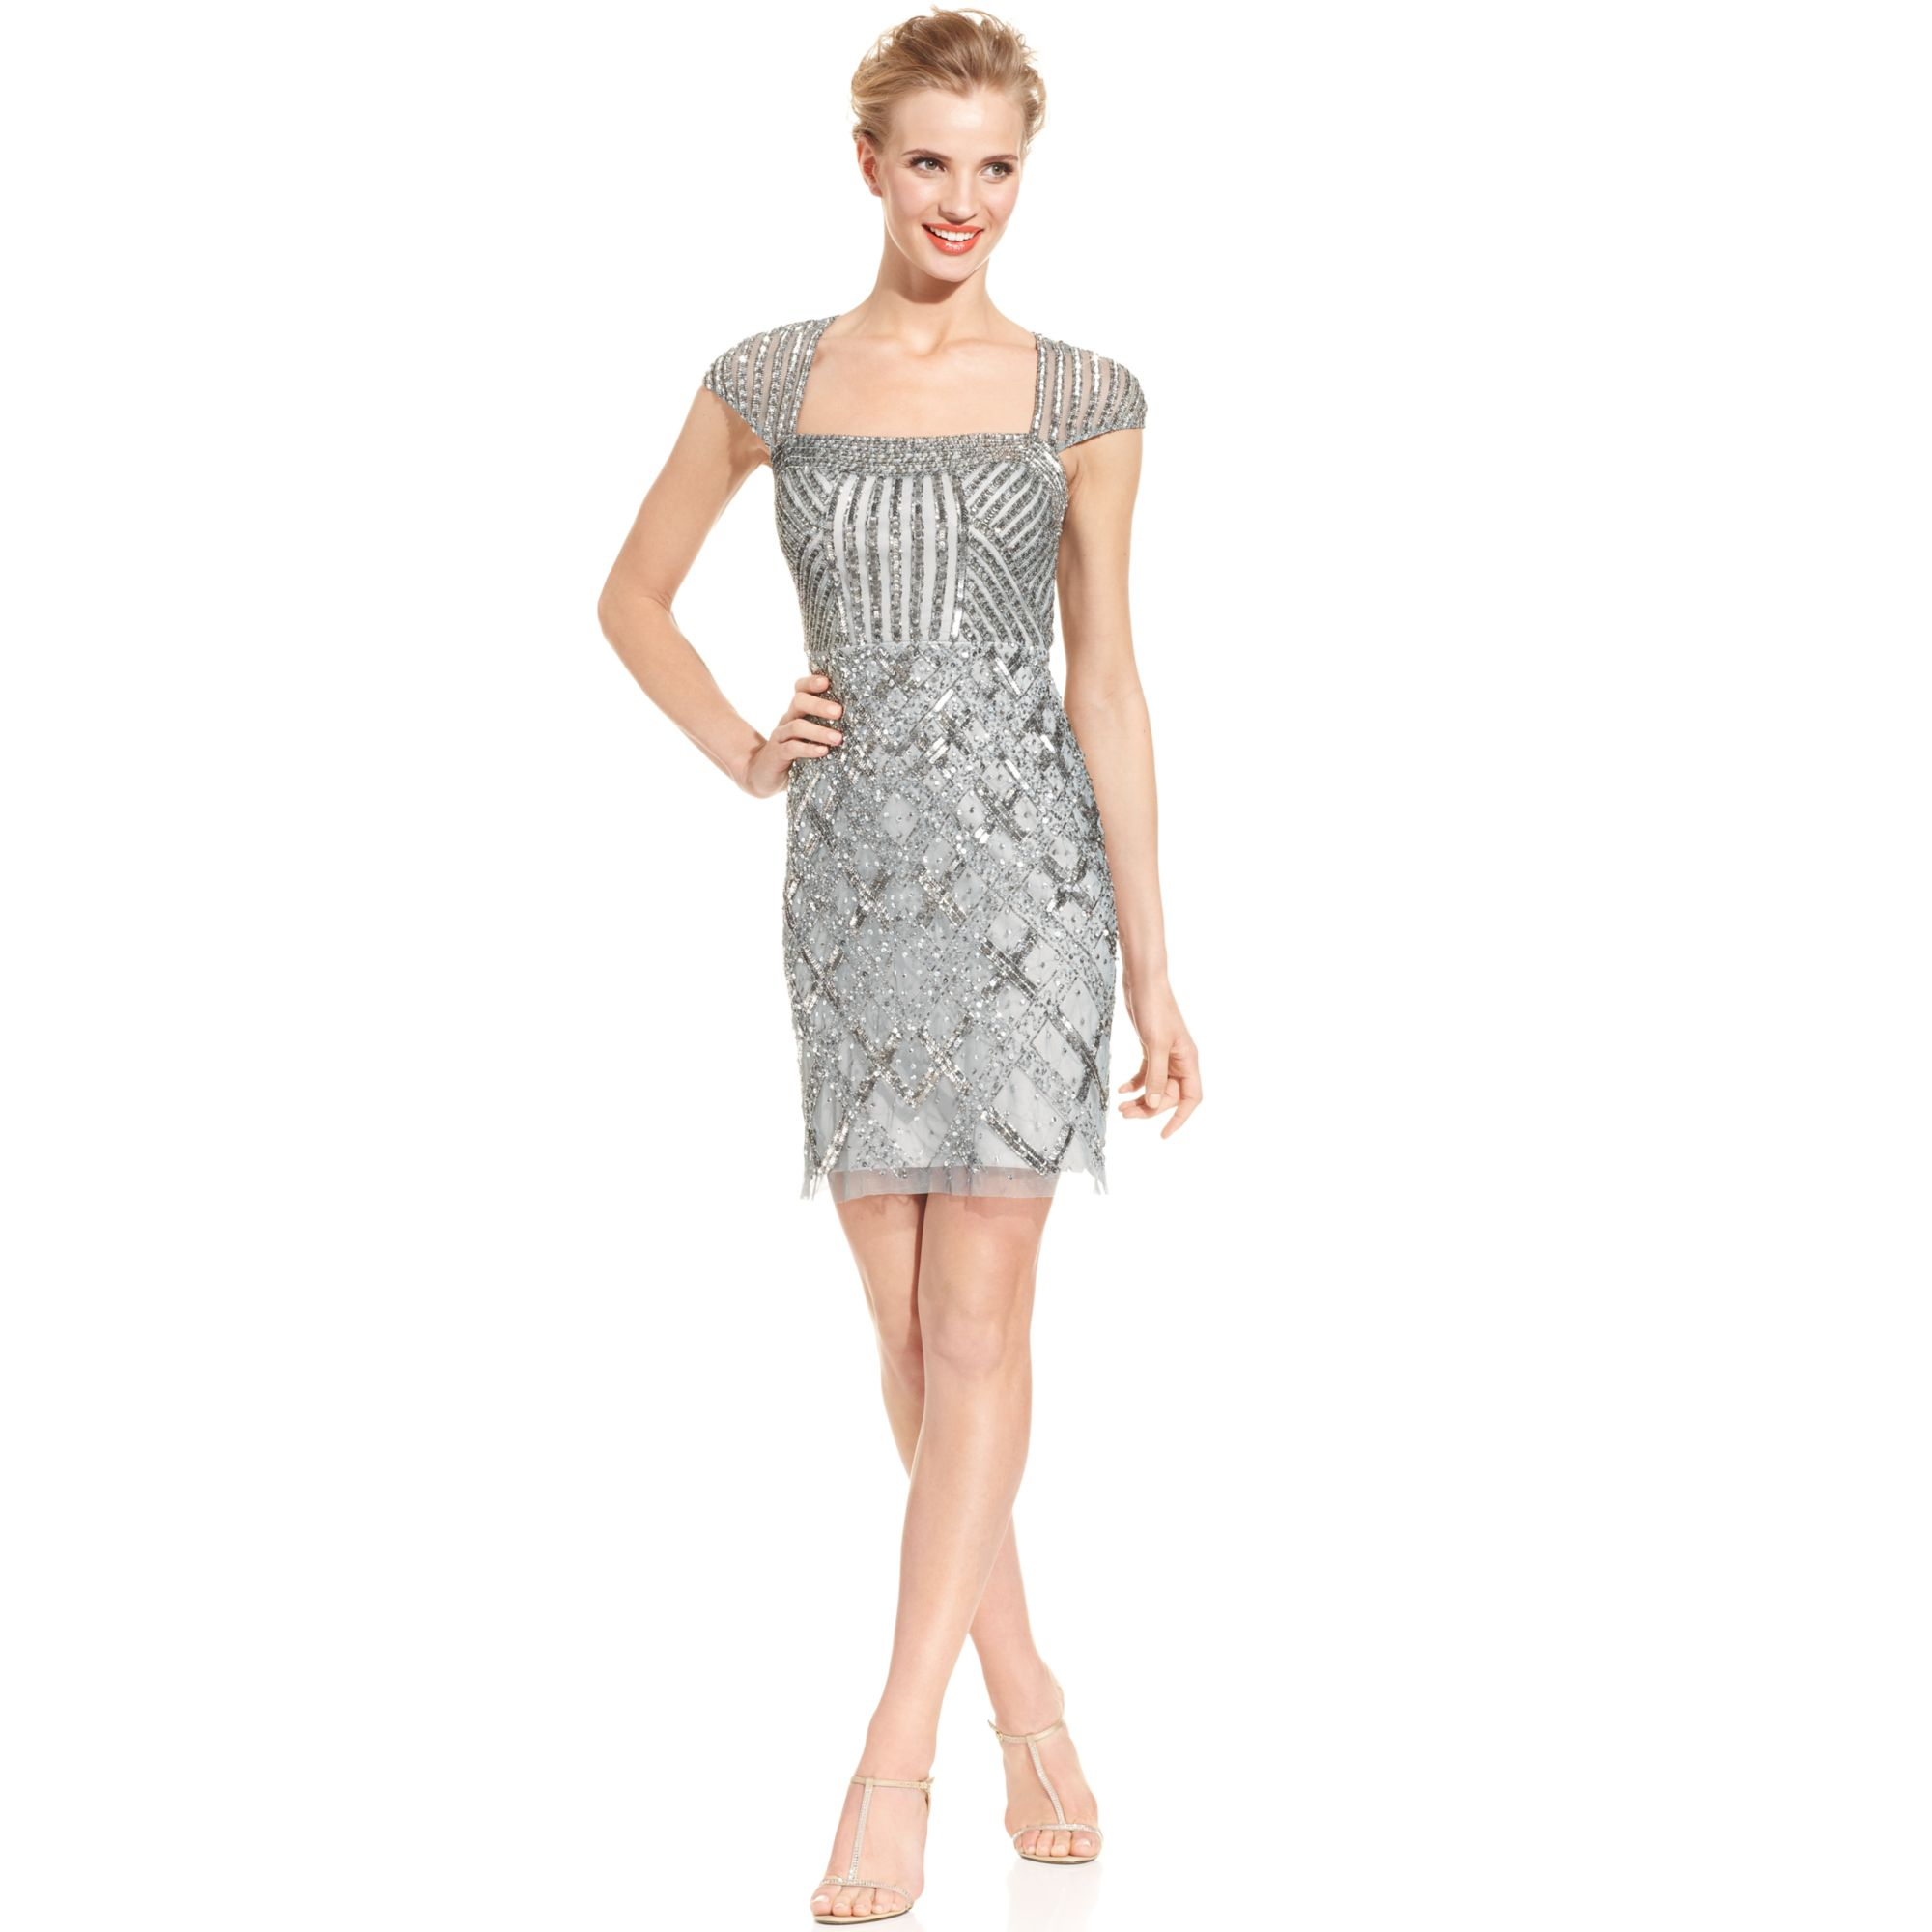 Adrianna Papell Beaded Cap Sleeve Dress